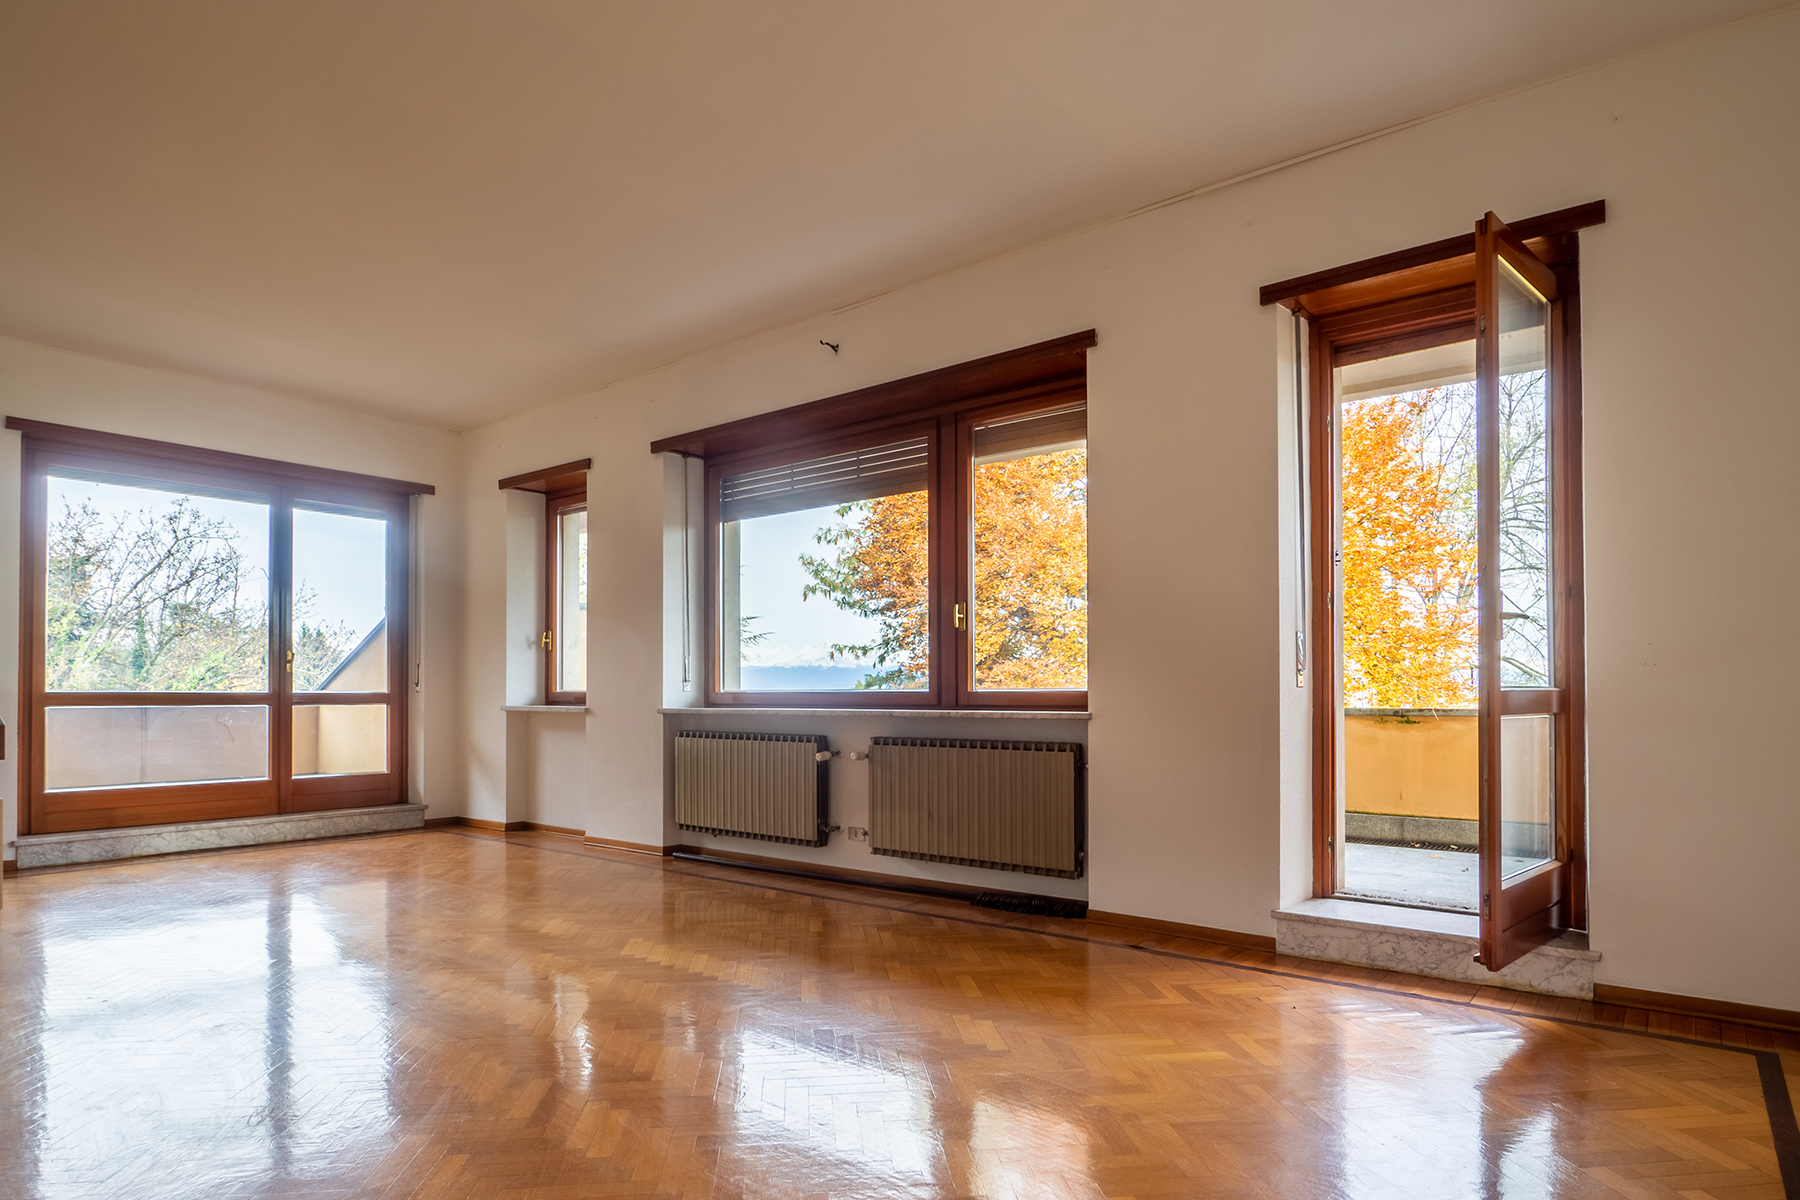 Casa indipendente in Vendita a Torino: 5 locali, 277 mq - Foto 4